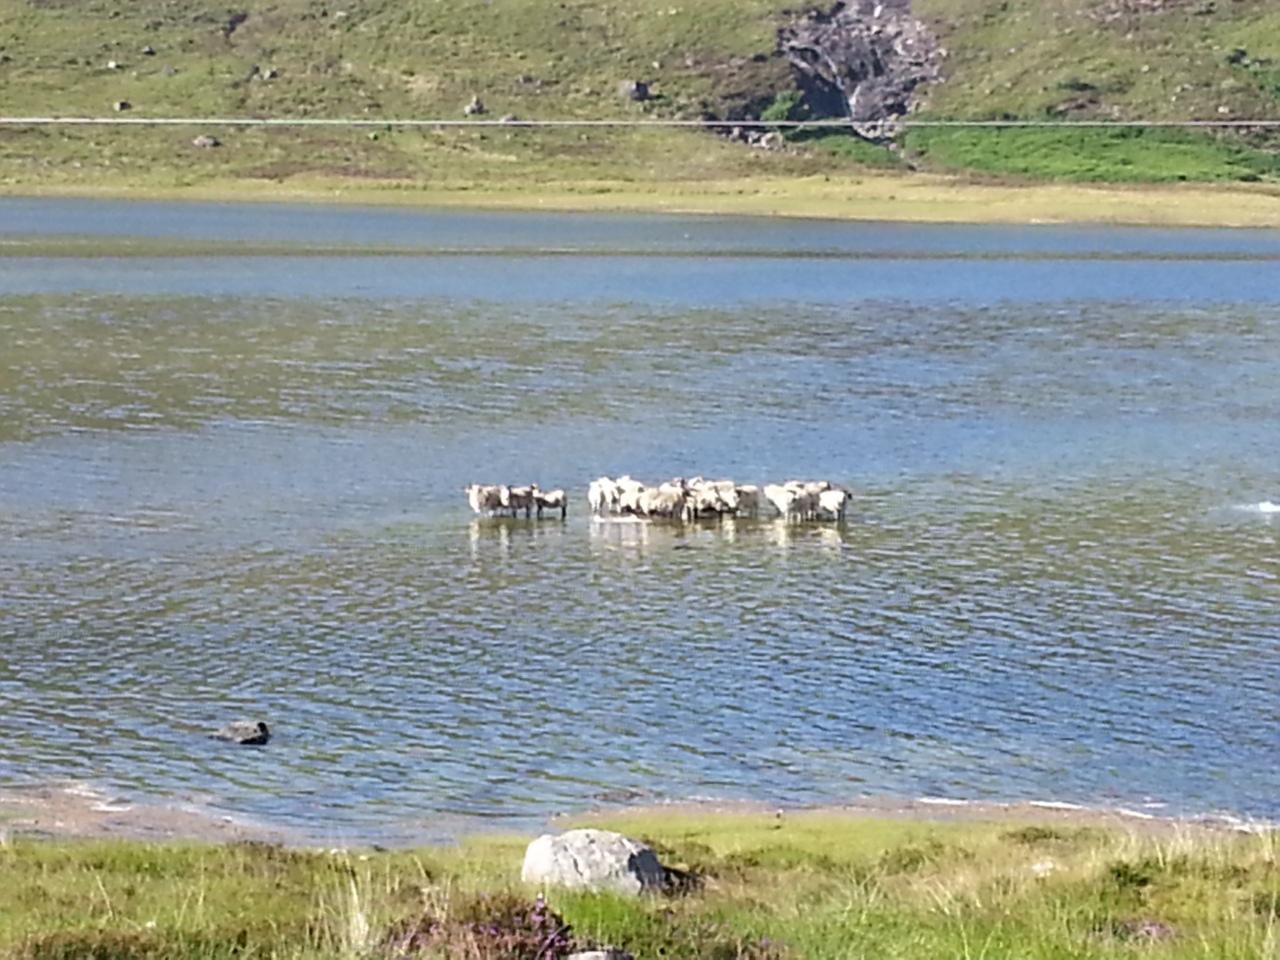 Perhaps the Loch Ness sheep